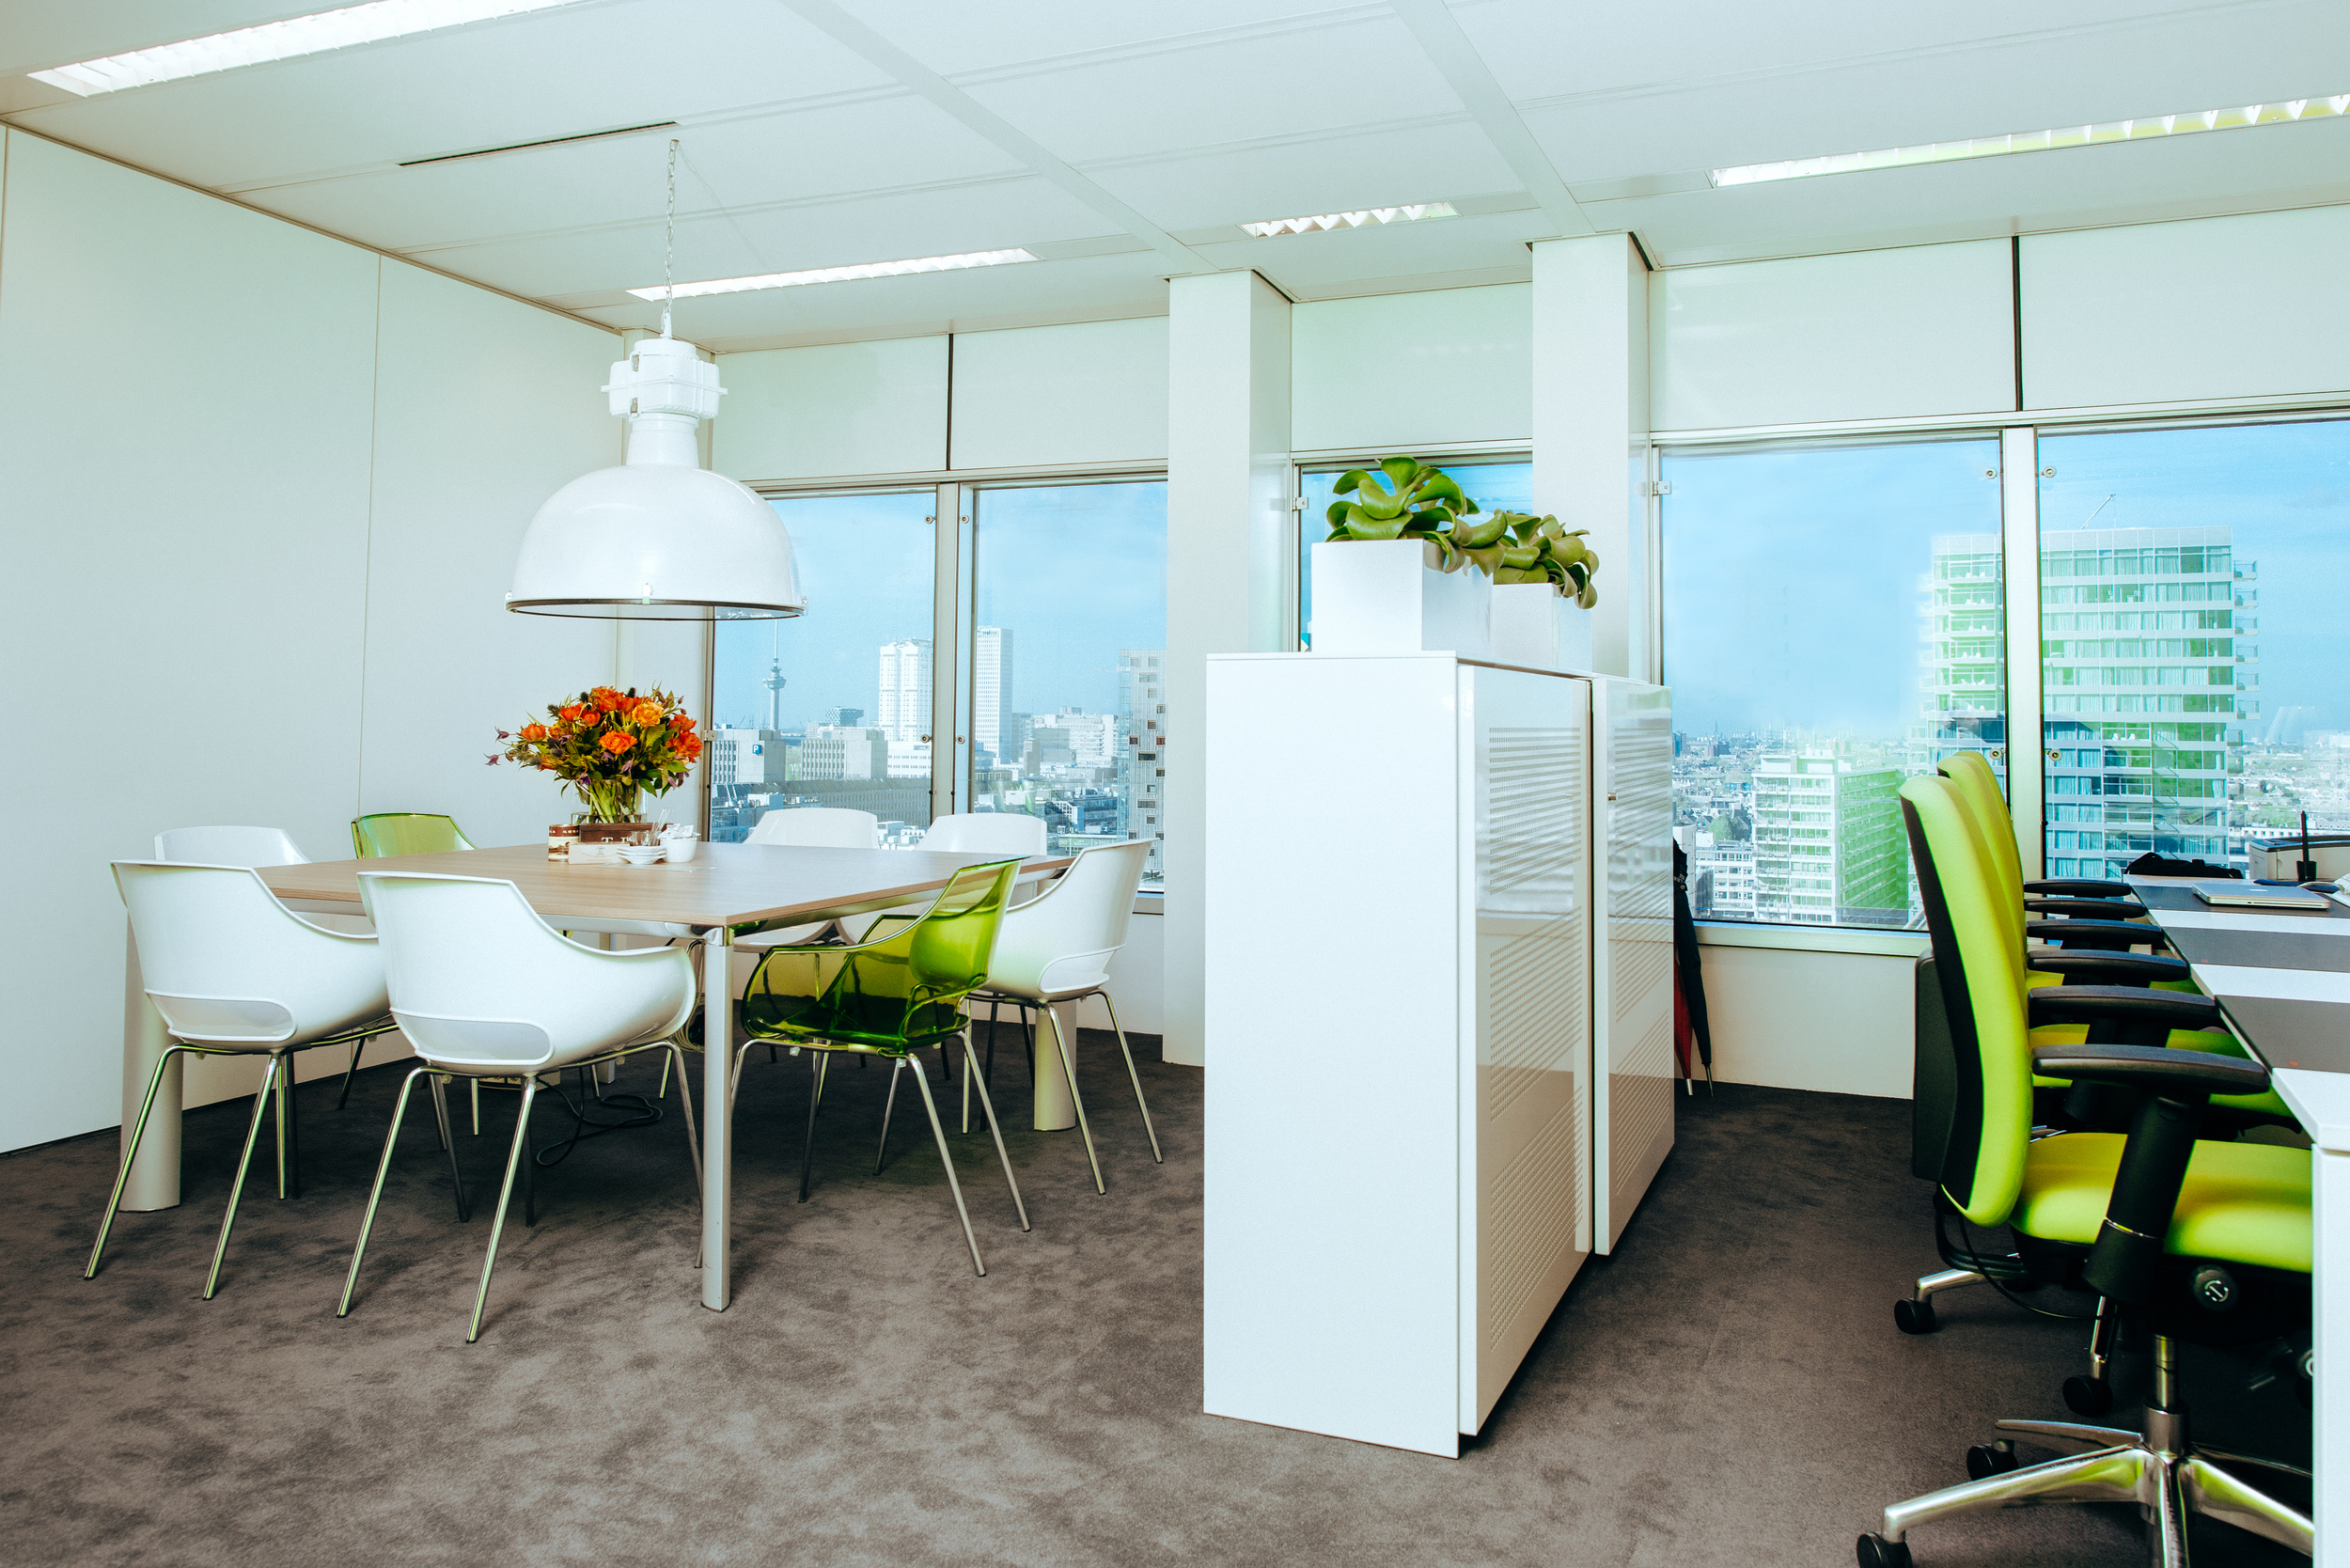 WTC Beurs-business center-interiors.08.jpg